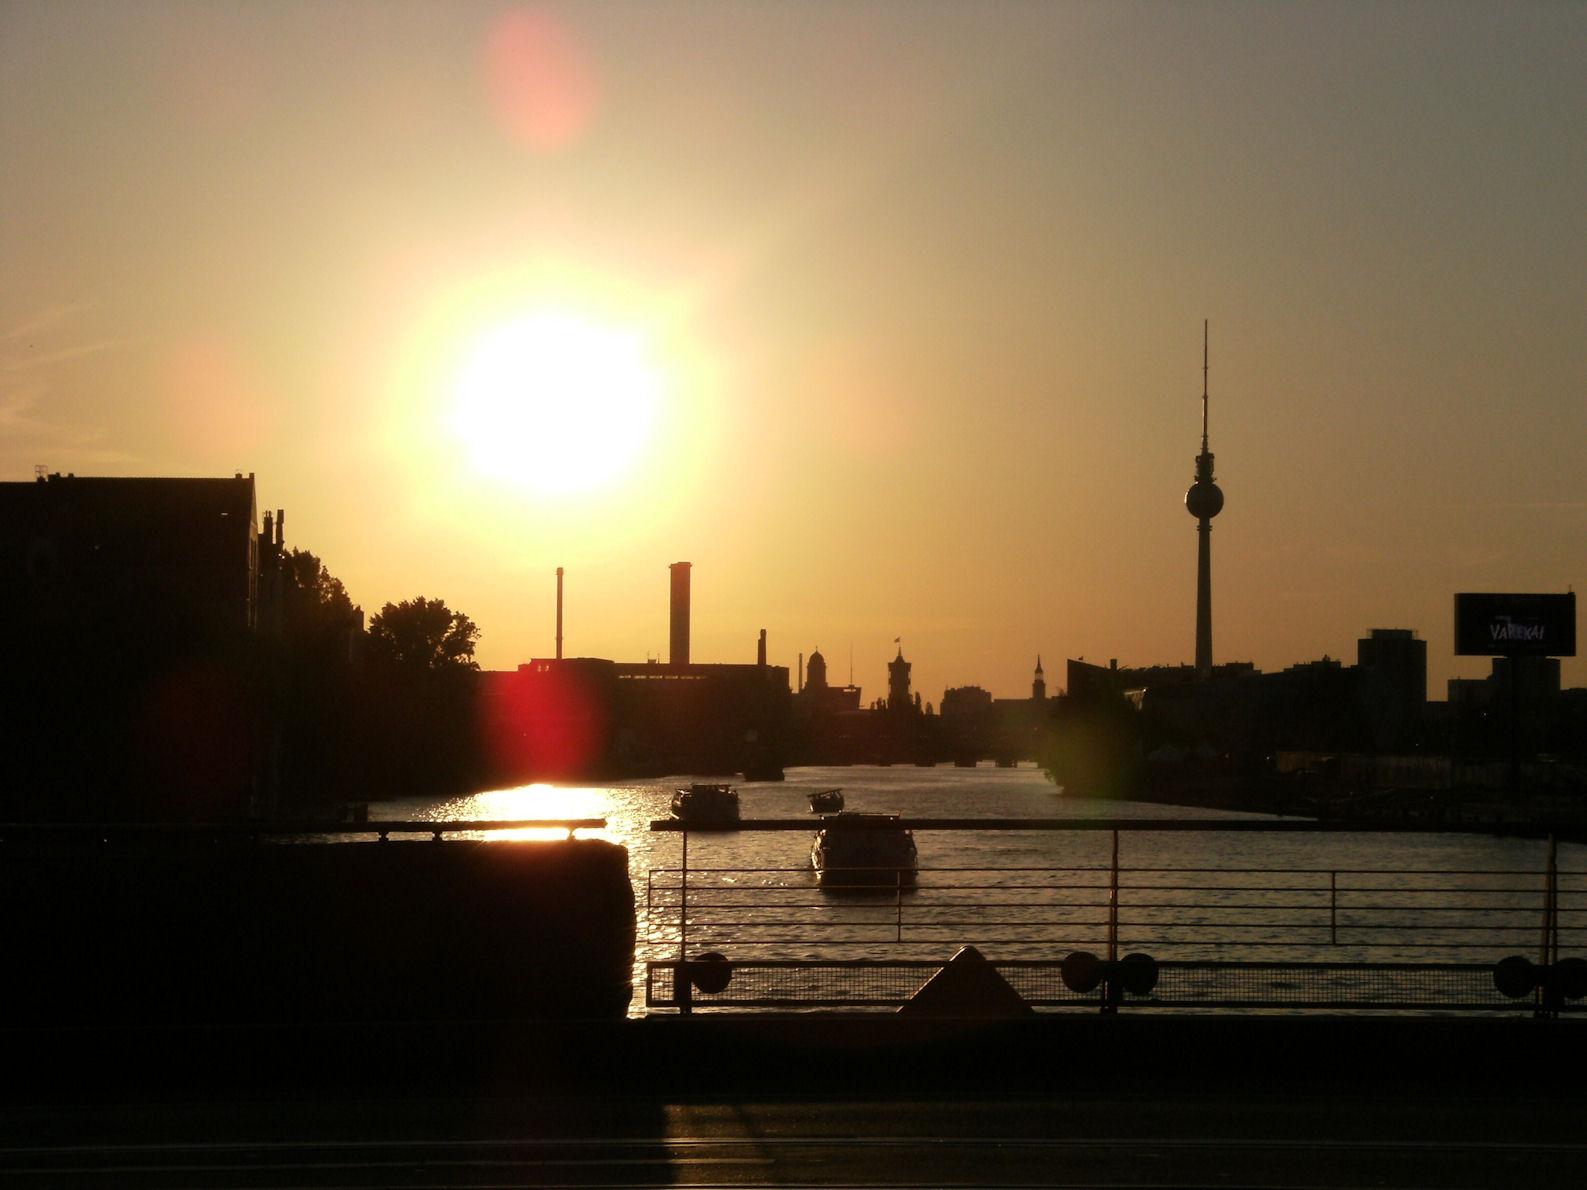 Helsinki – Berliini meno-paluu lennot alkaen 77€!